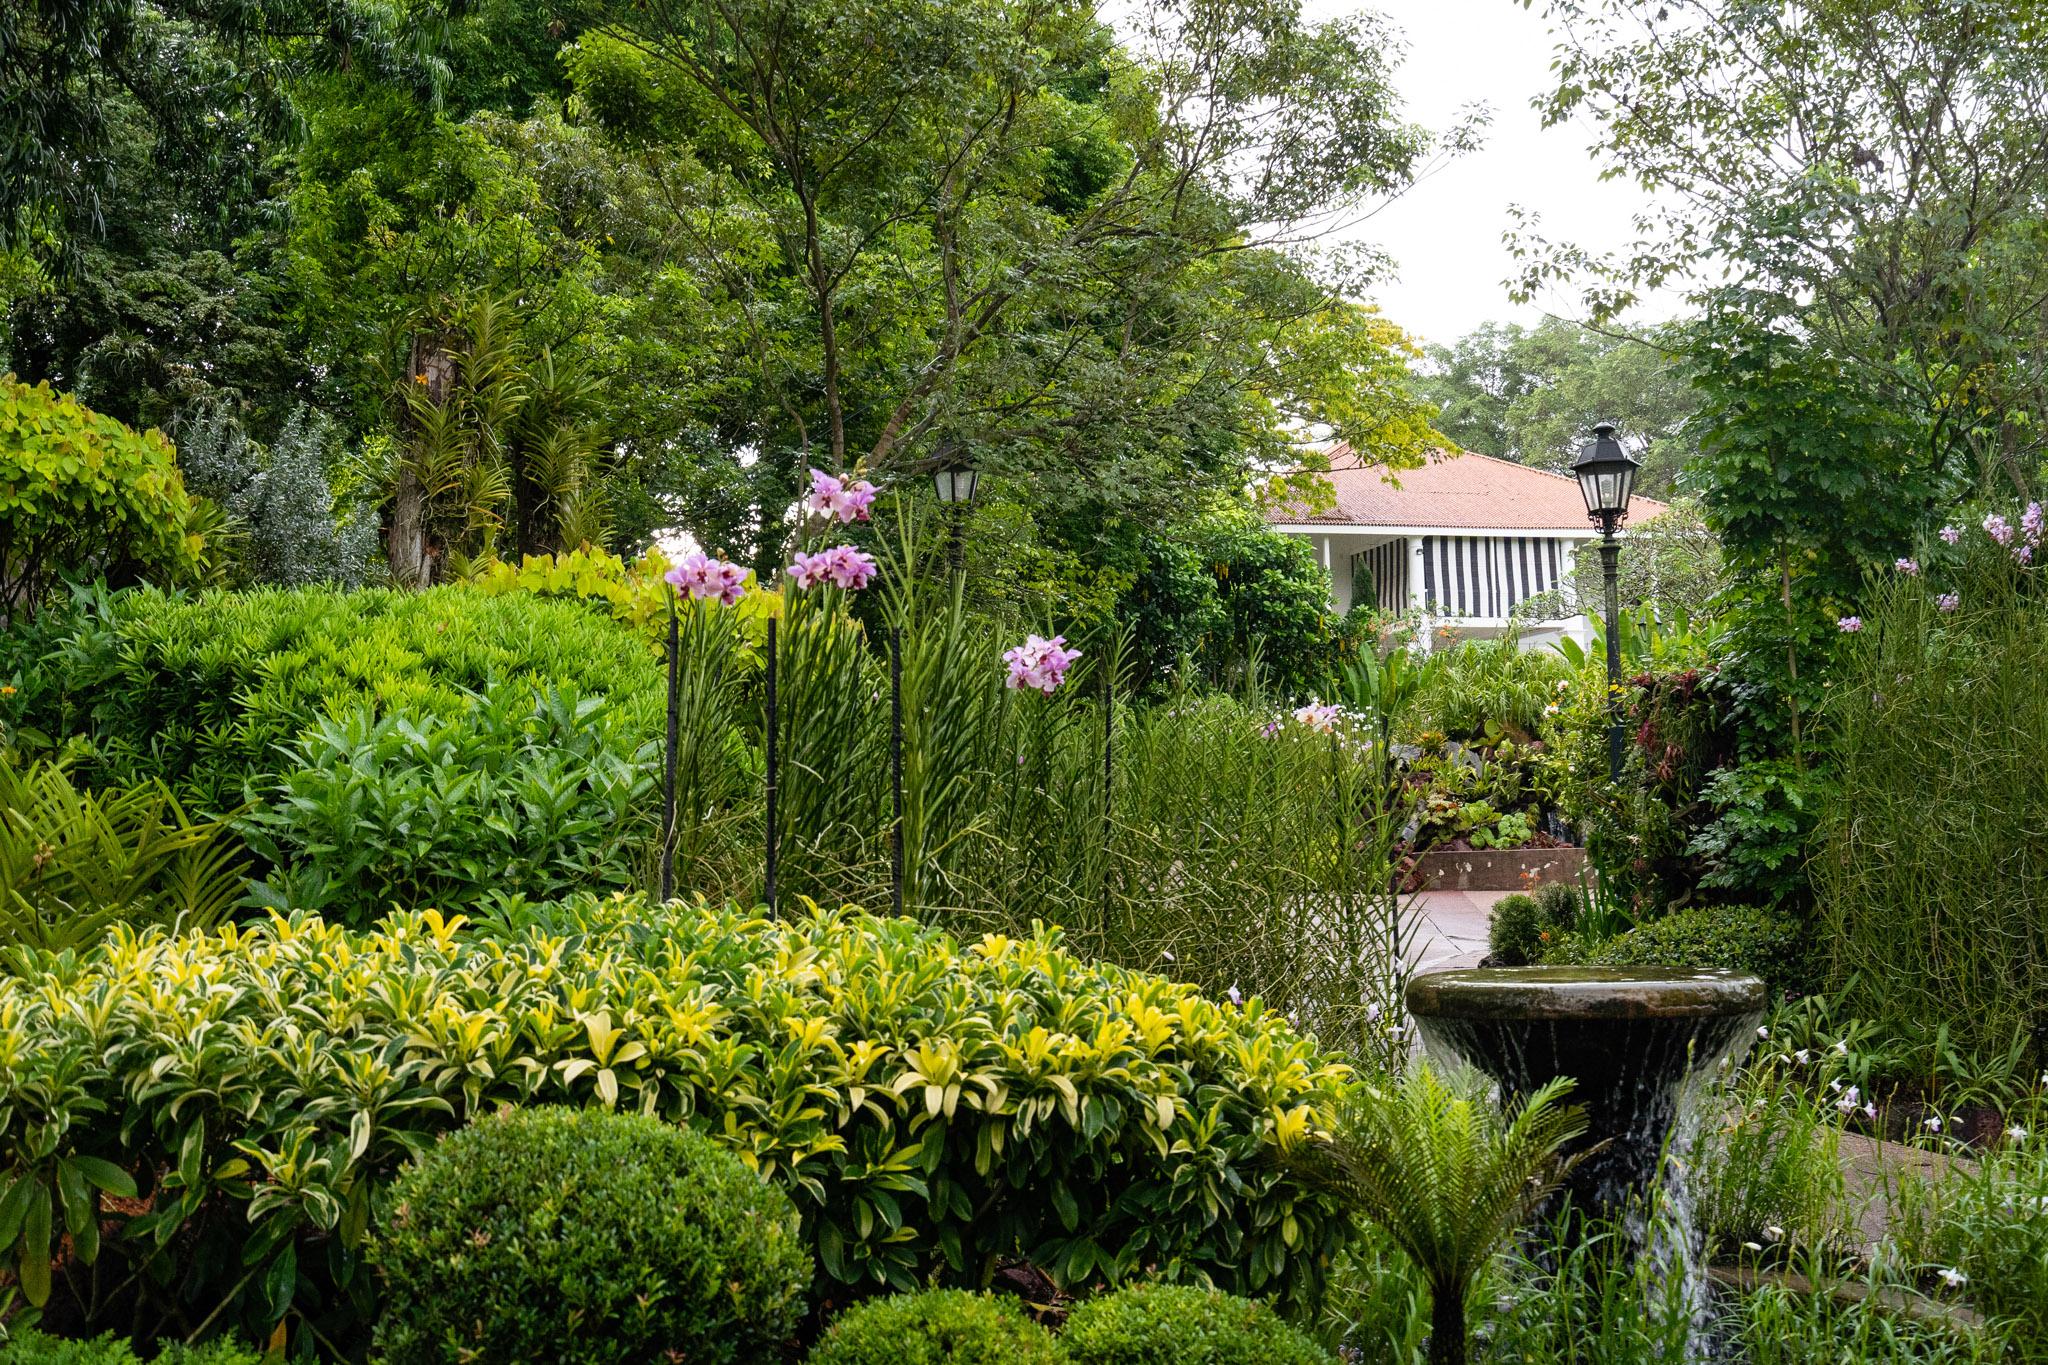 viator-singapore-photographer-tourism-tours-zoo-little-india-gardens-marina-bay-002.jpg